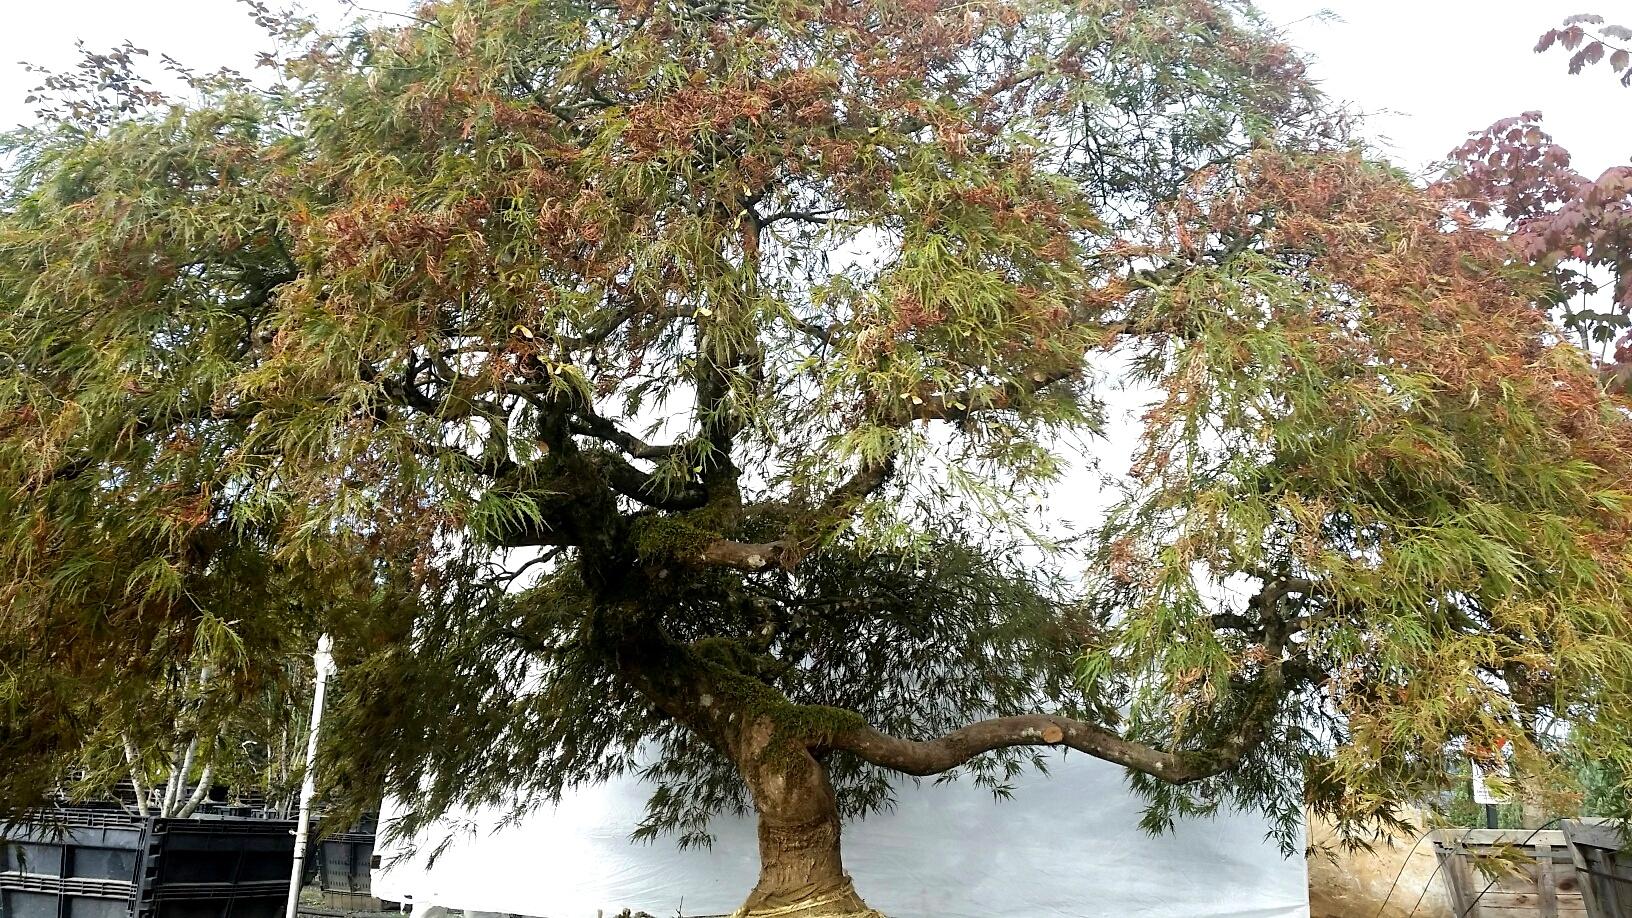 Acer p.d. 'Ornatum'SPECIMEN #3, low branches